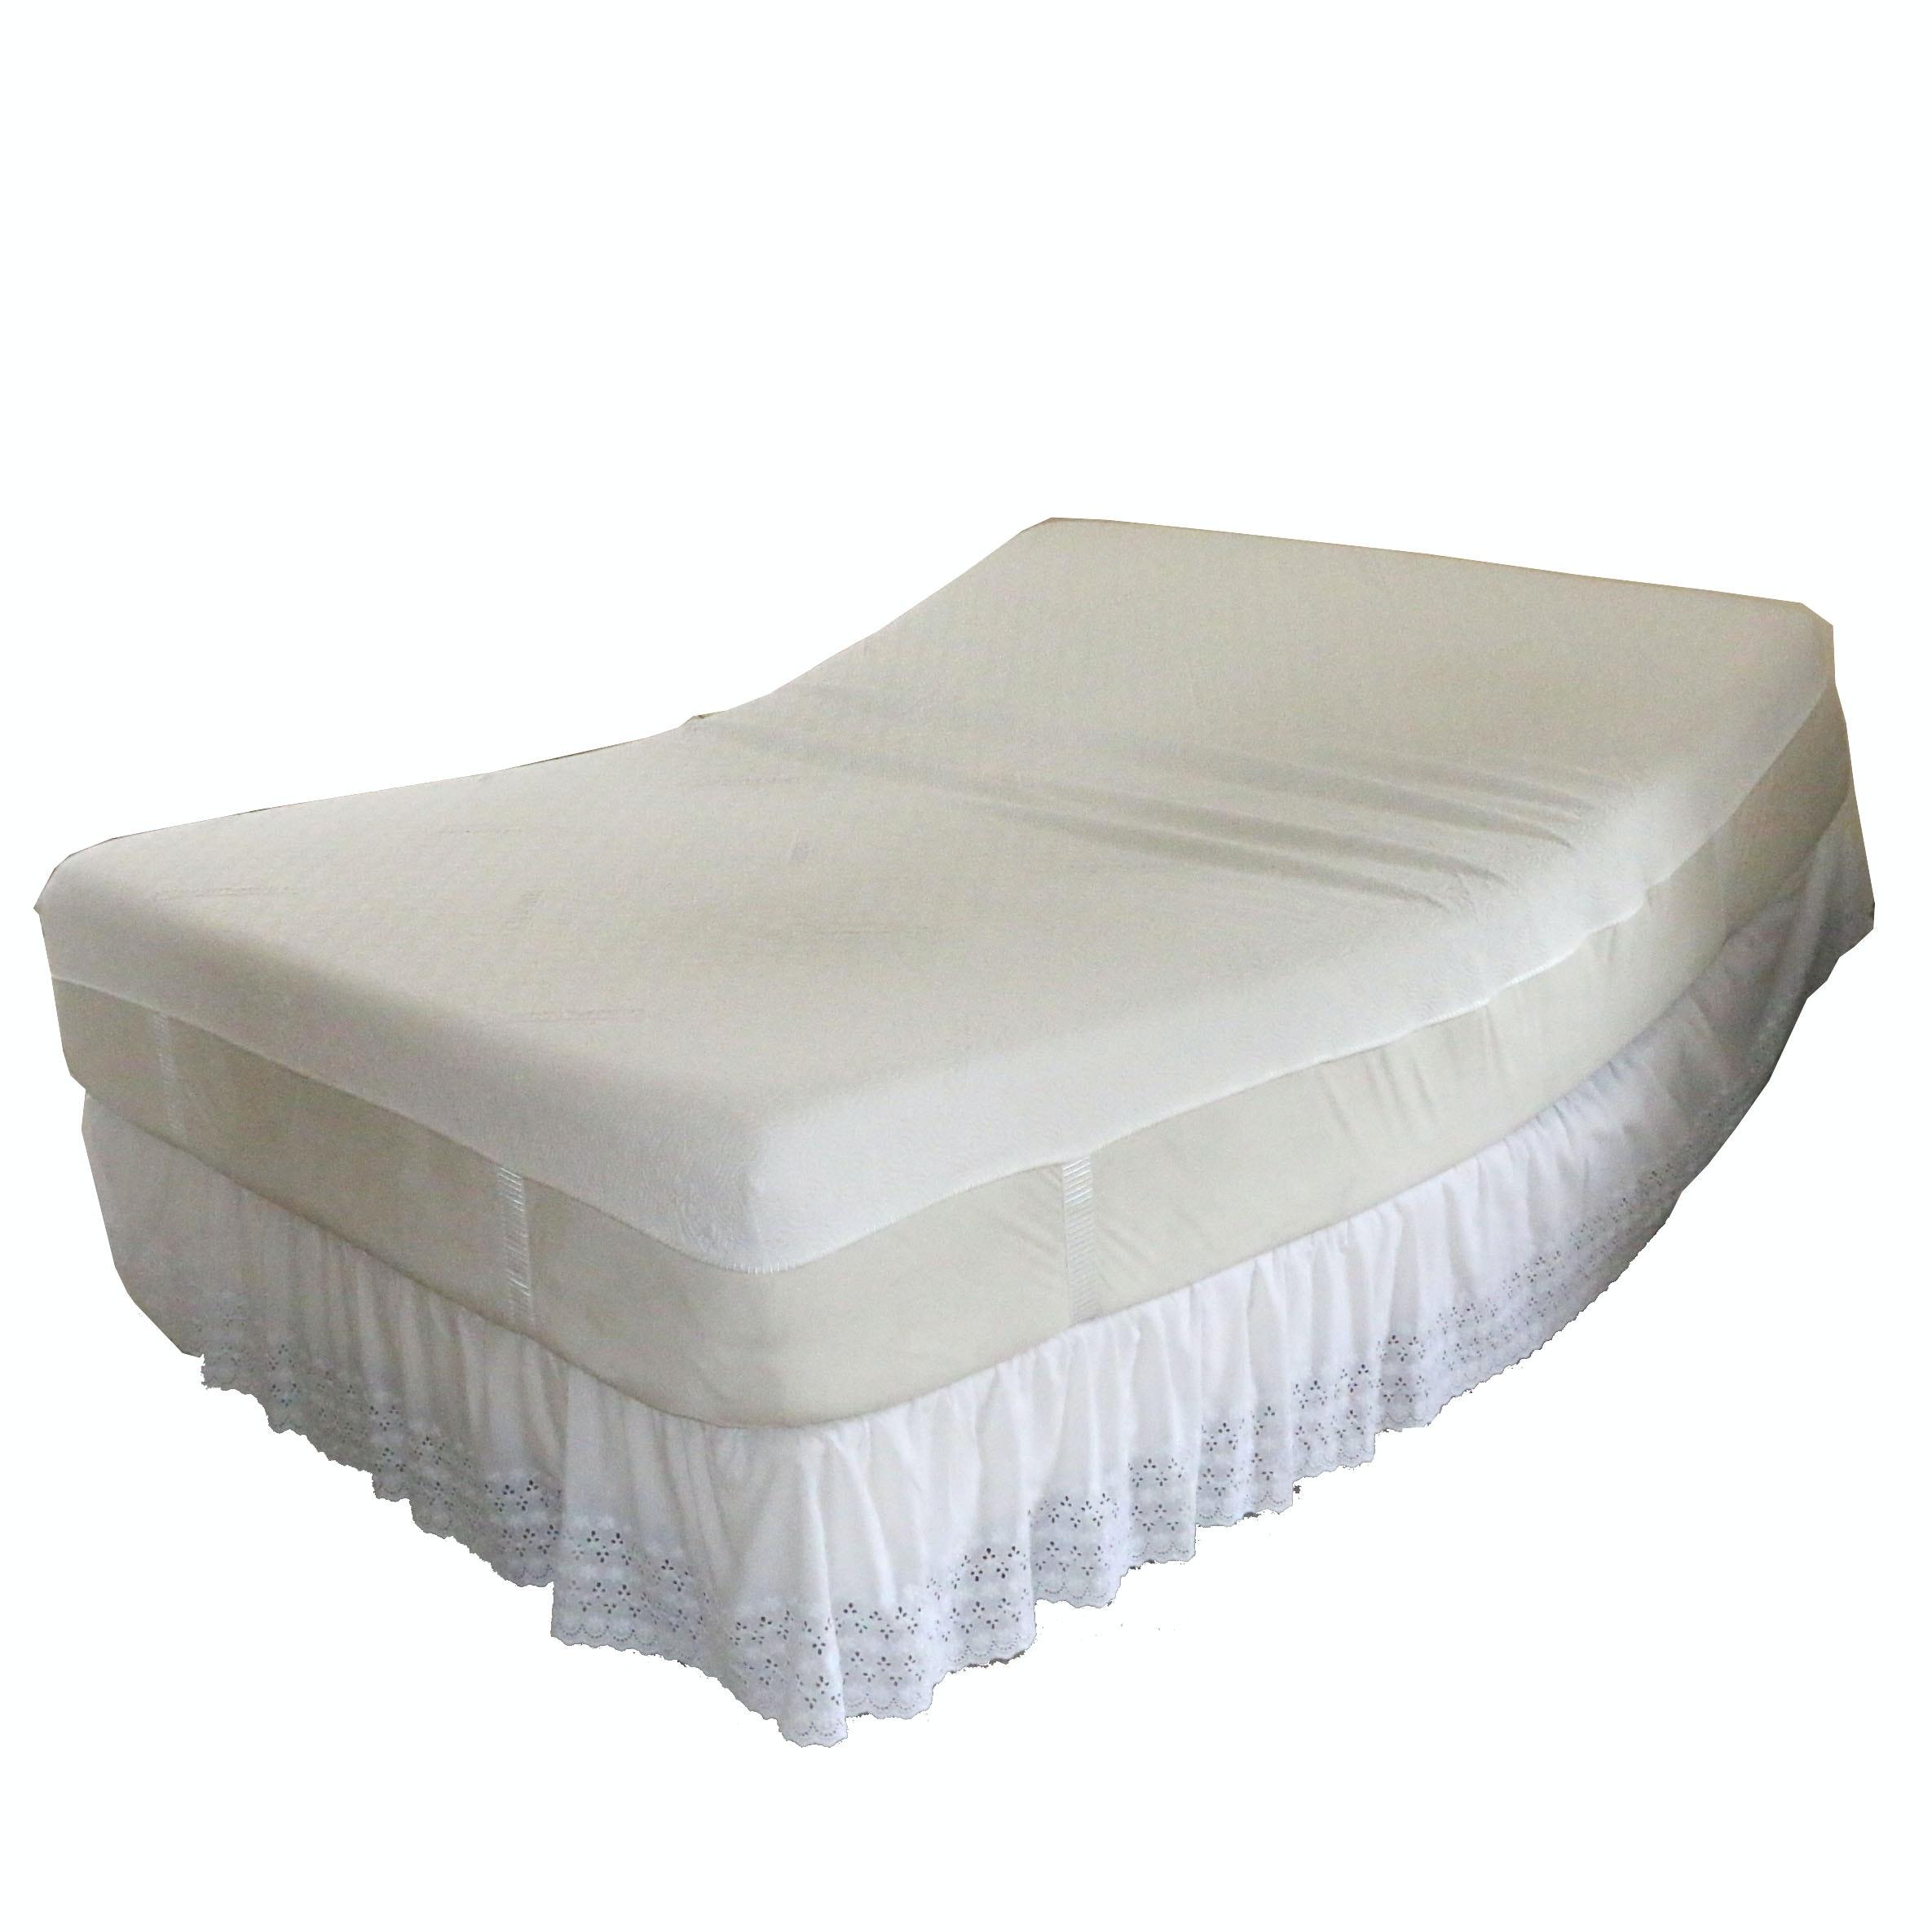 Tempur-Pedic Cloud Luxe Lift and Massage Mattress & Box Spring